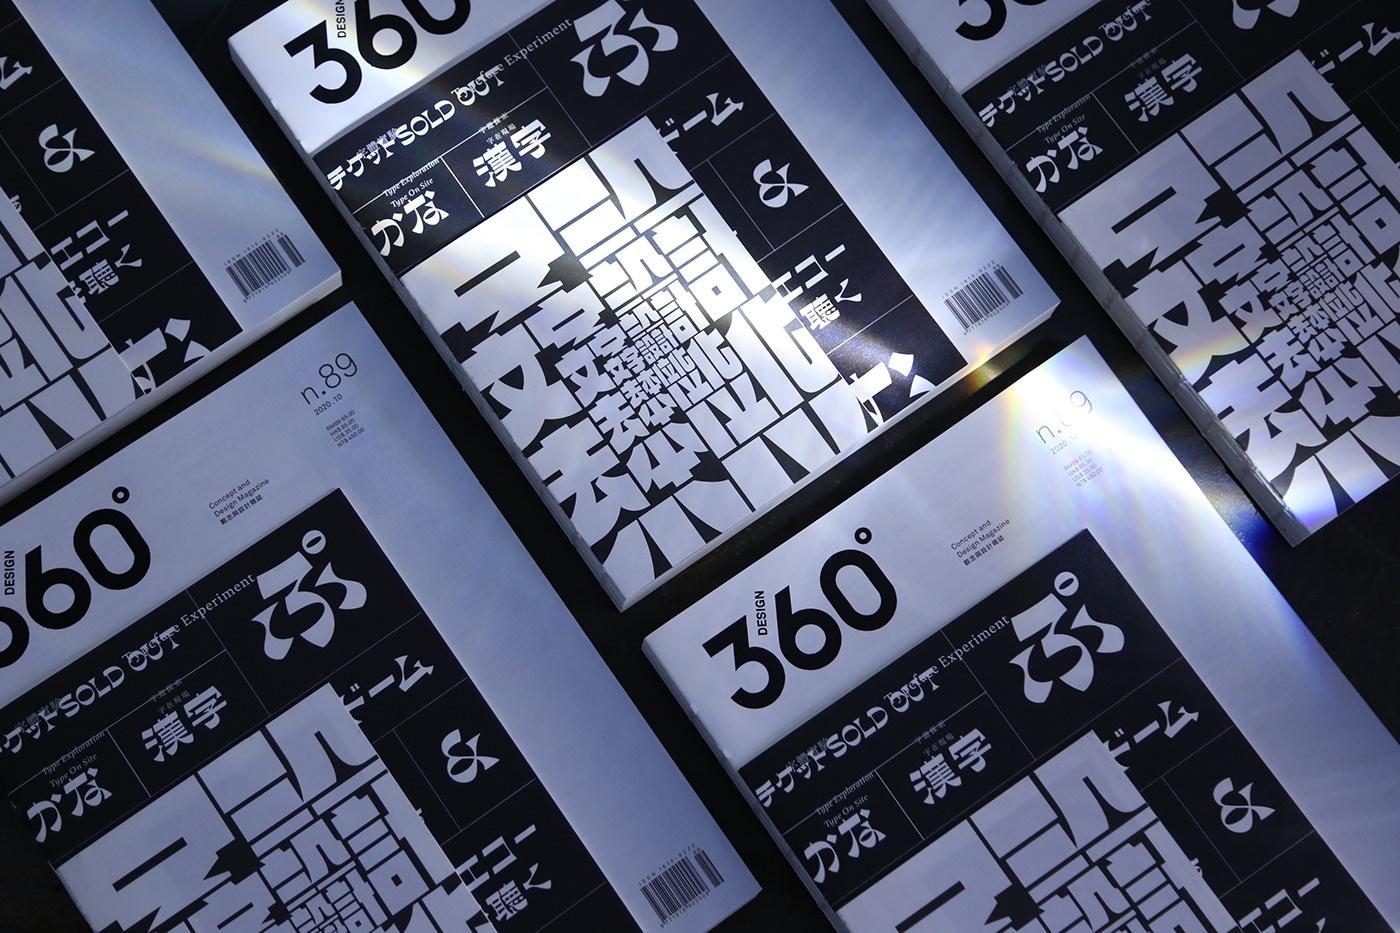 Bind design magazine design360 editorial experiment Layout magazine print Typeface Fashion